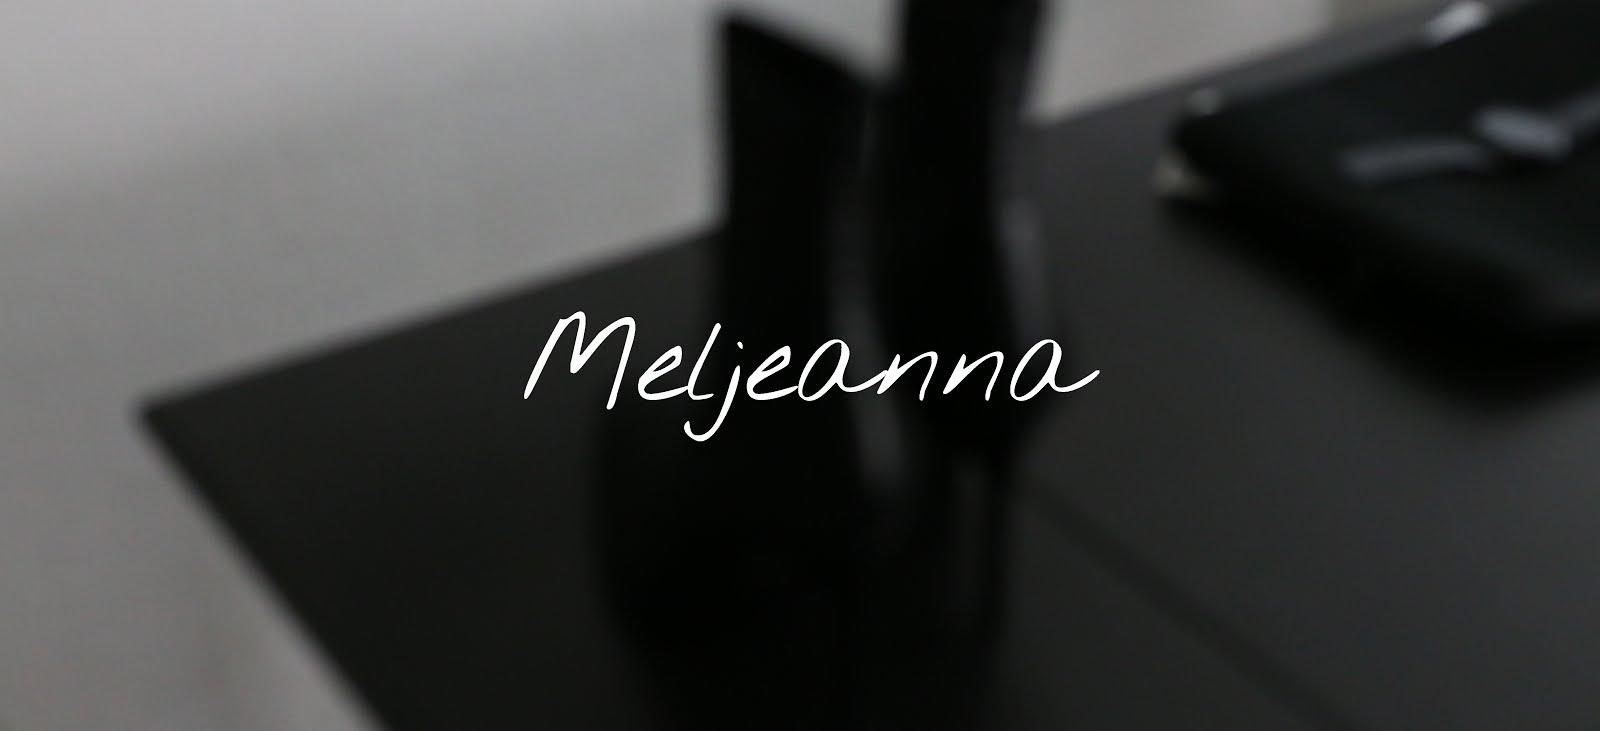 Meljeanna